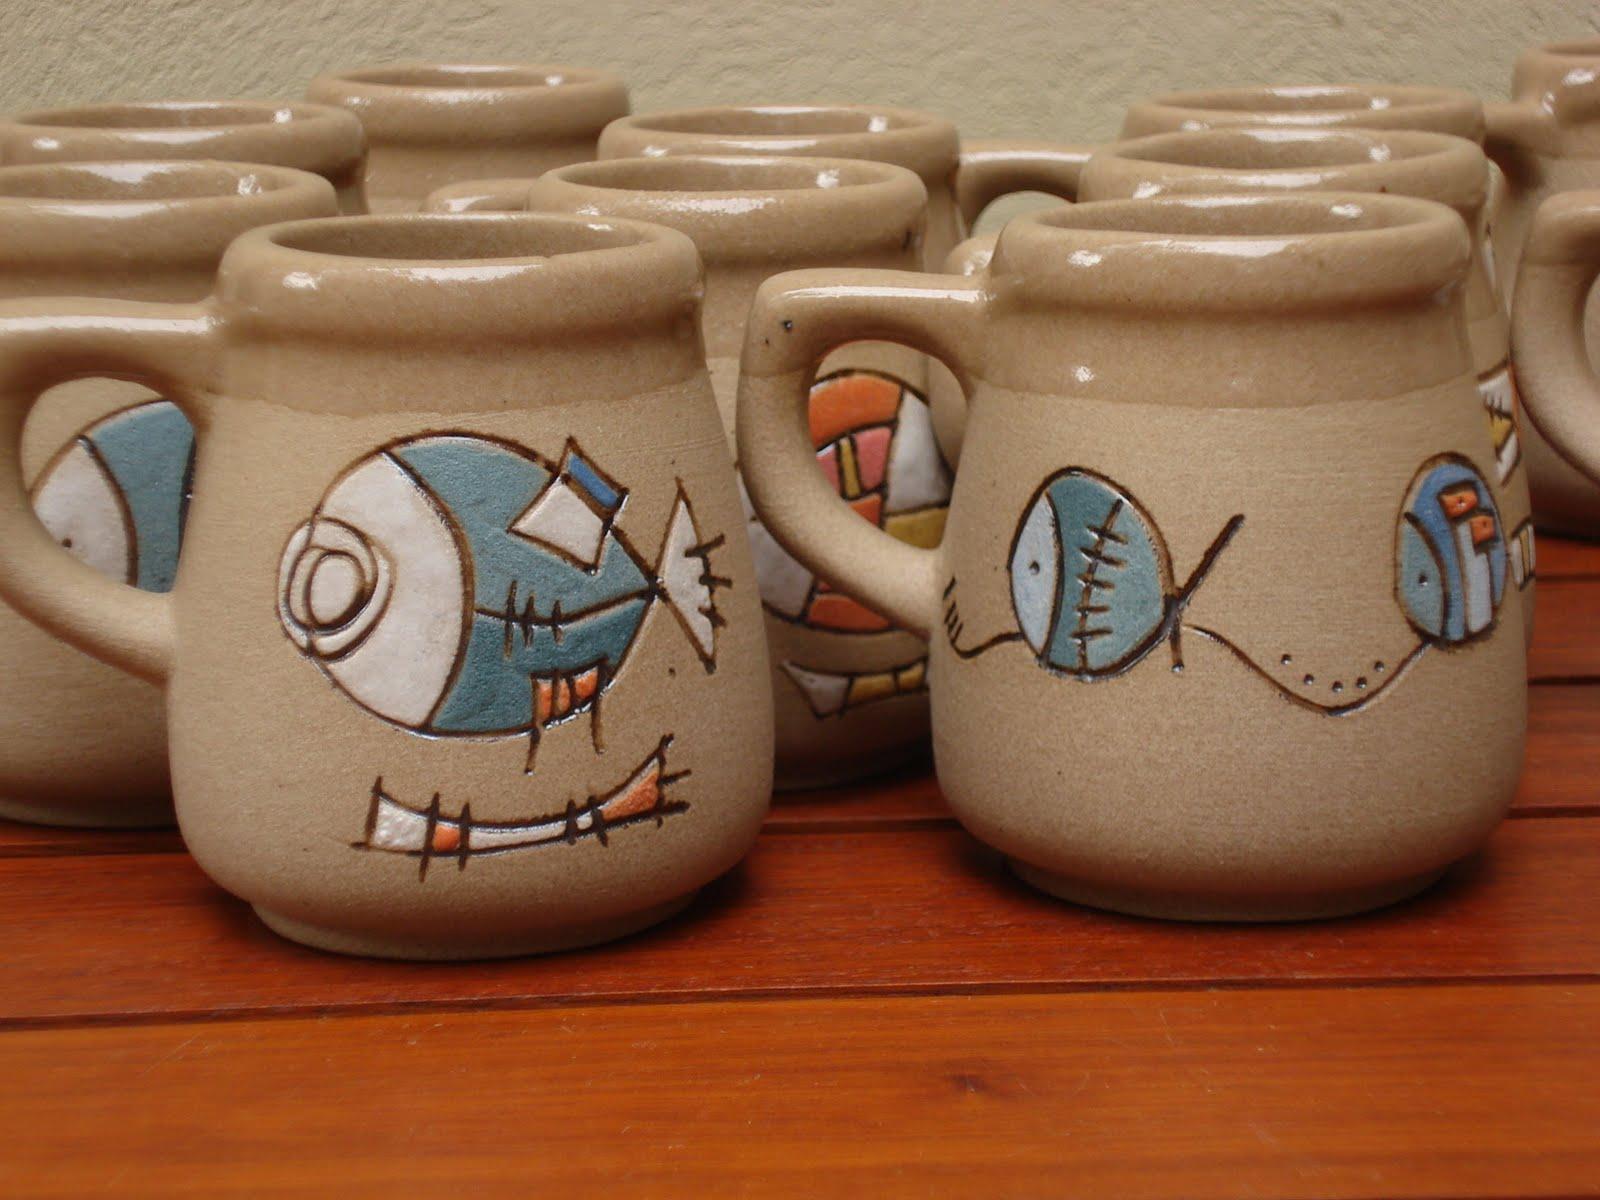 Ceramica el cuenco linea tostada for Materiales para ceramica artesanal